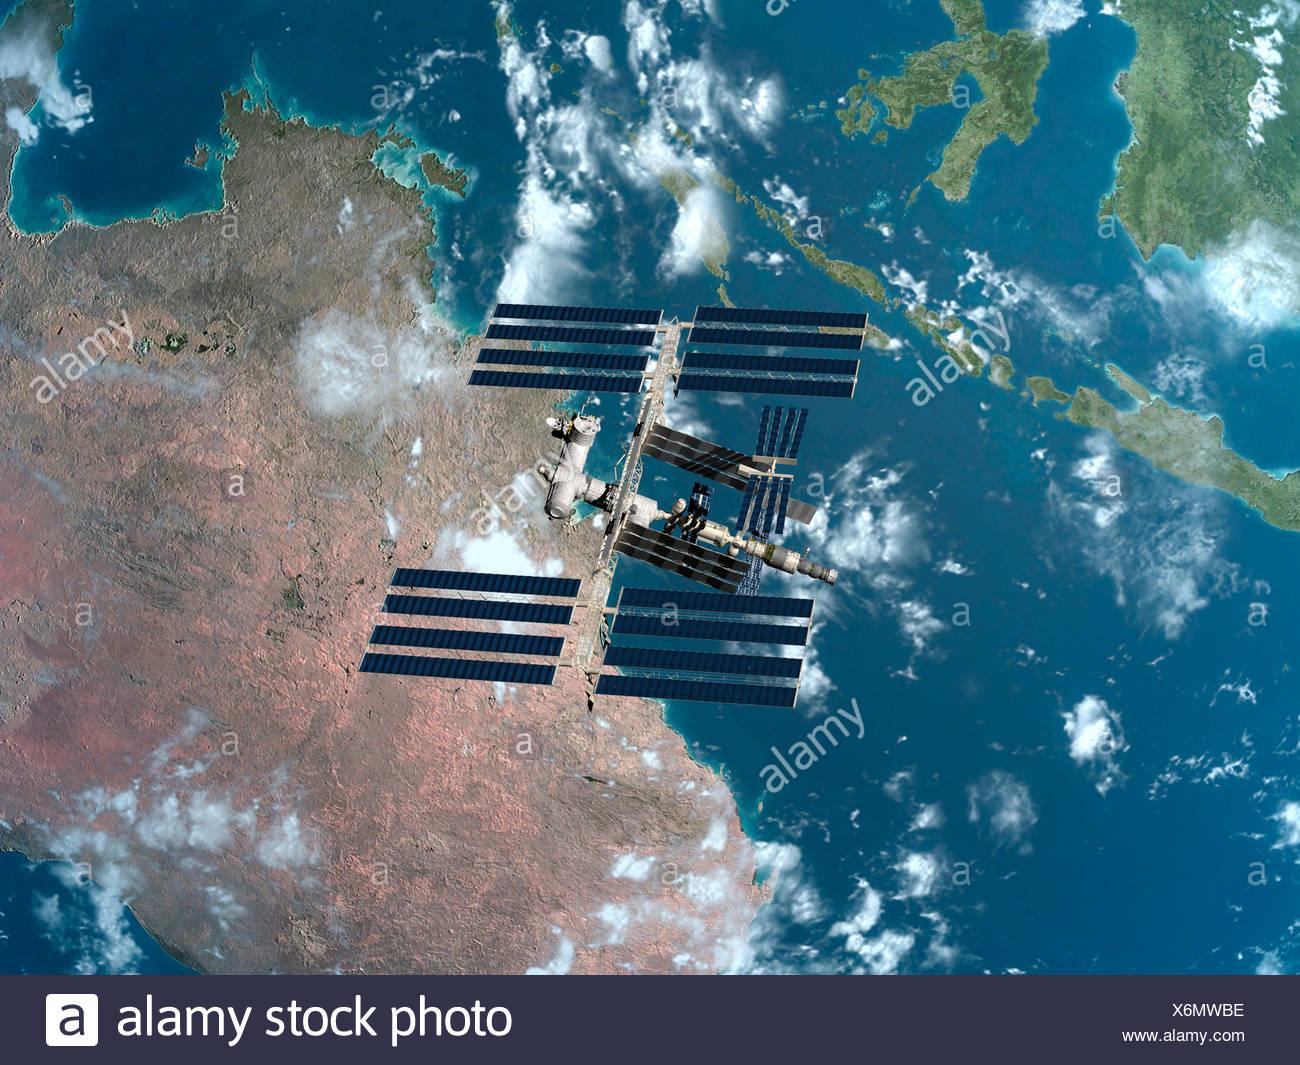 Station spatiale internationale, artwork Photo Stock